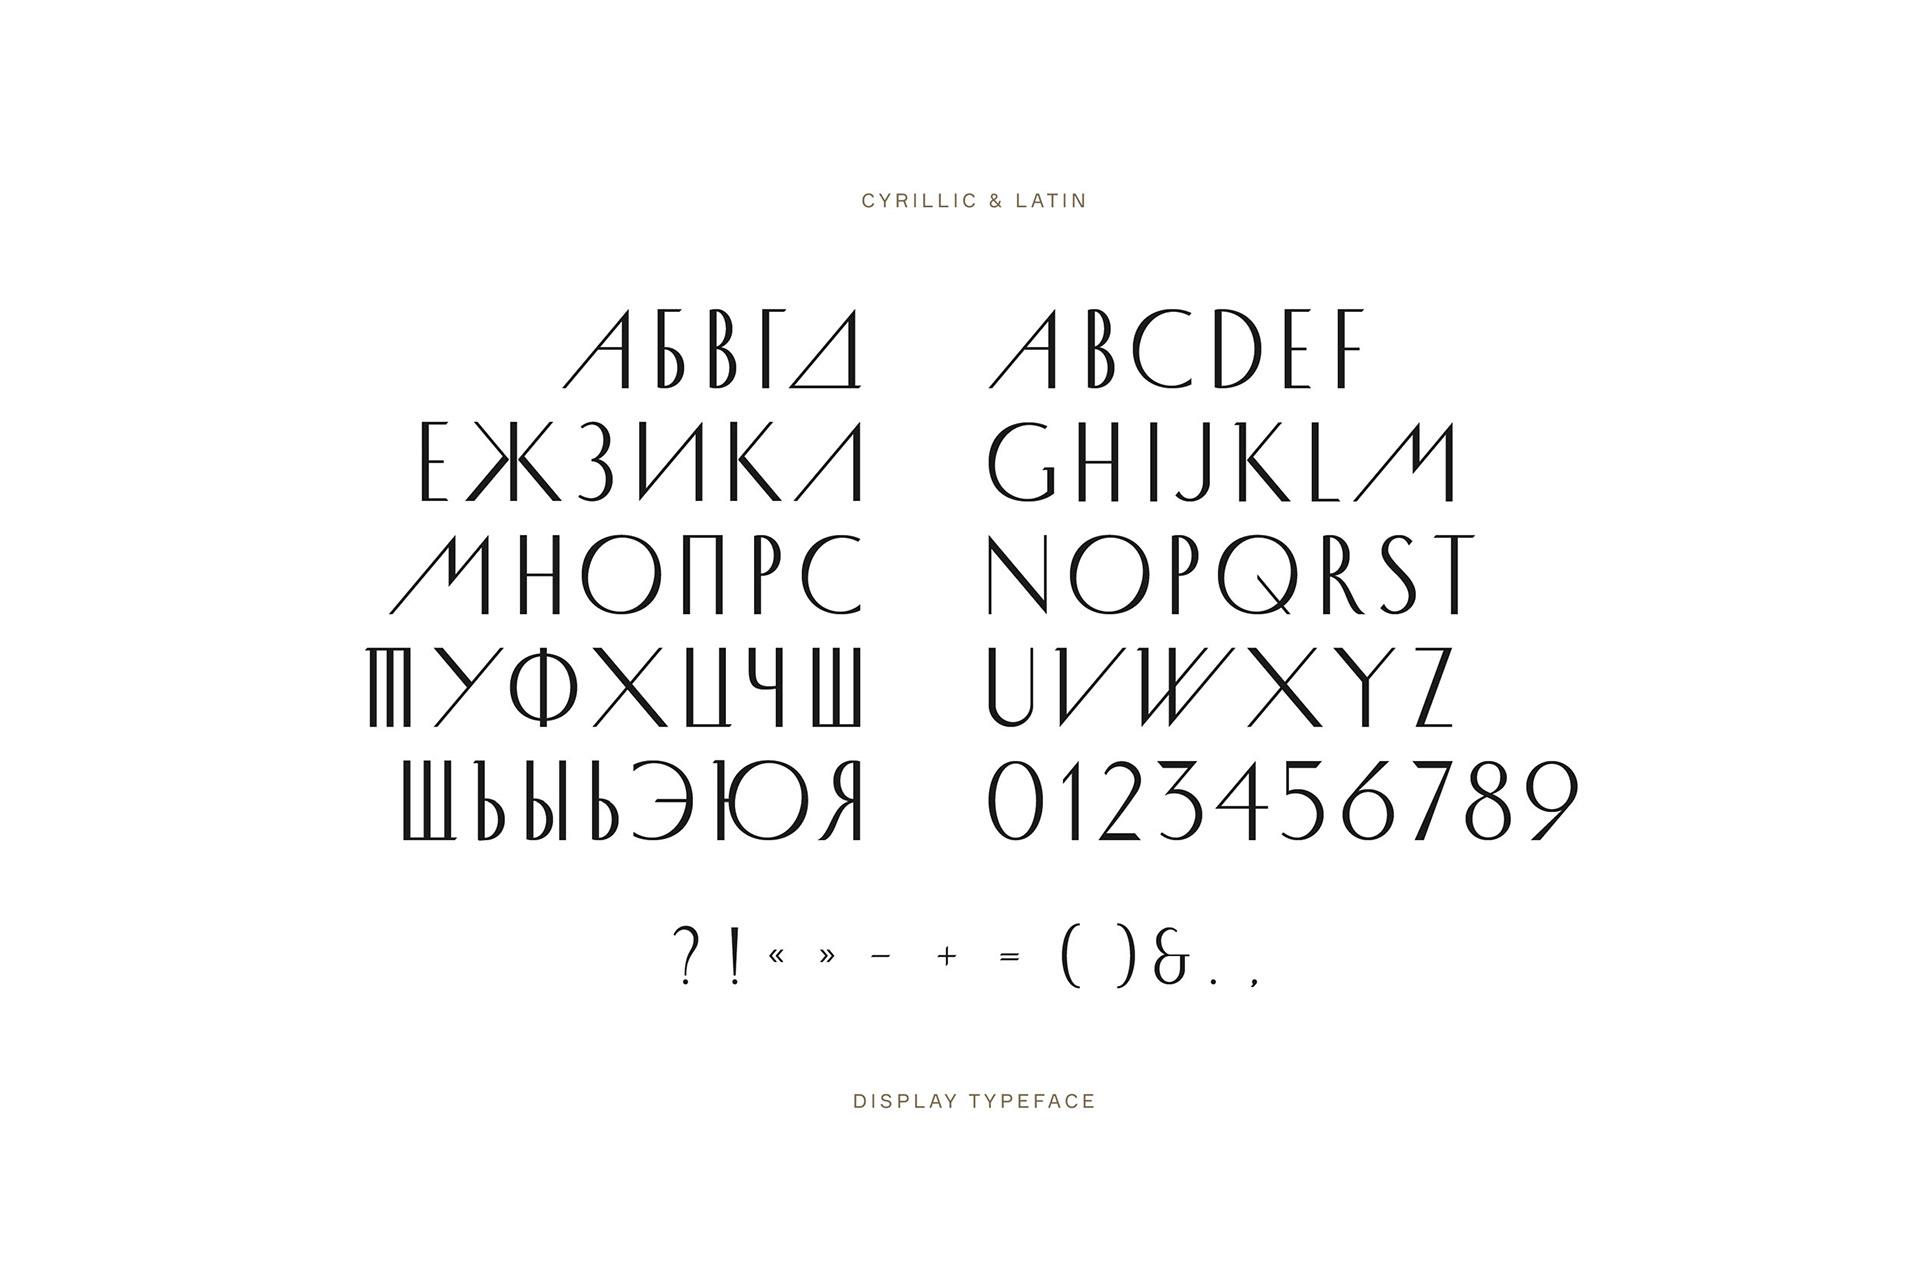 Palace of Sports Free Font - decorative-display, cyrillic